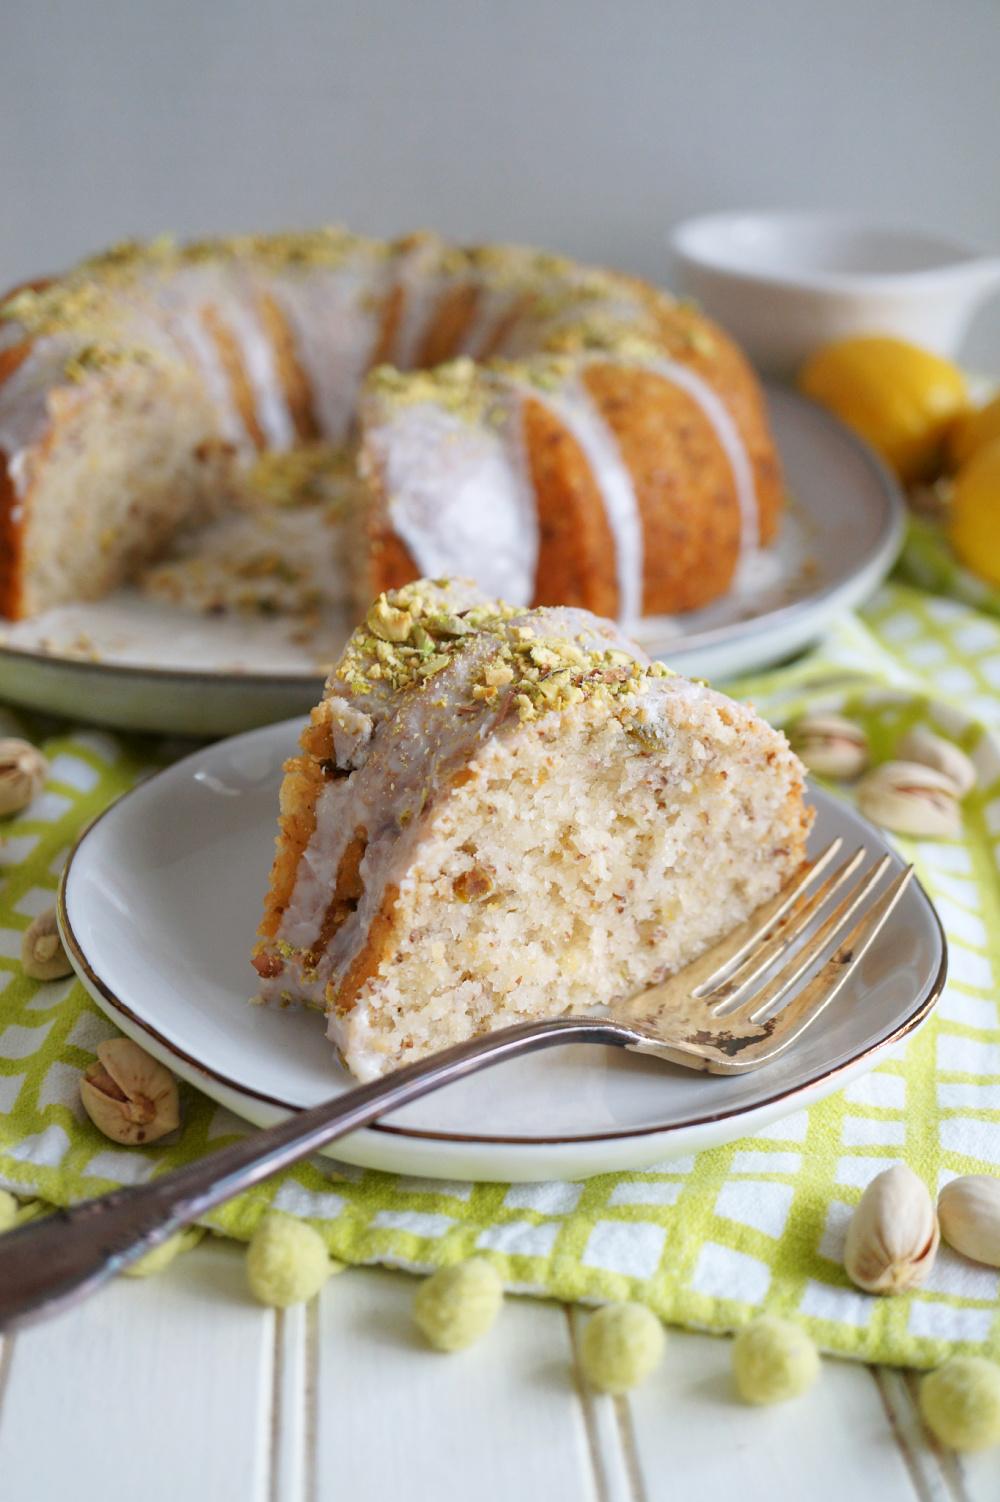 slice of lemon pistachio bundt on plate